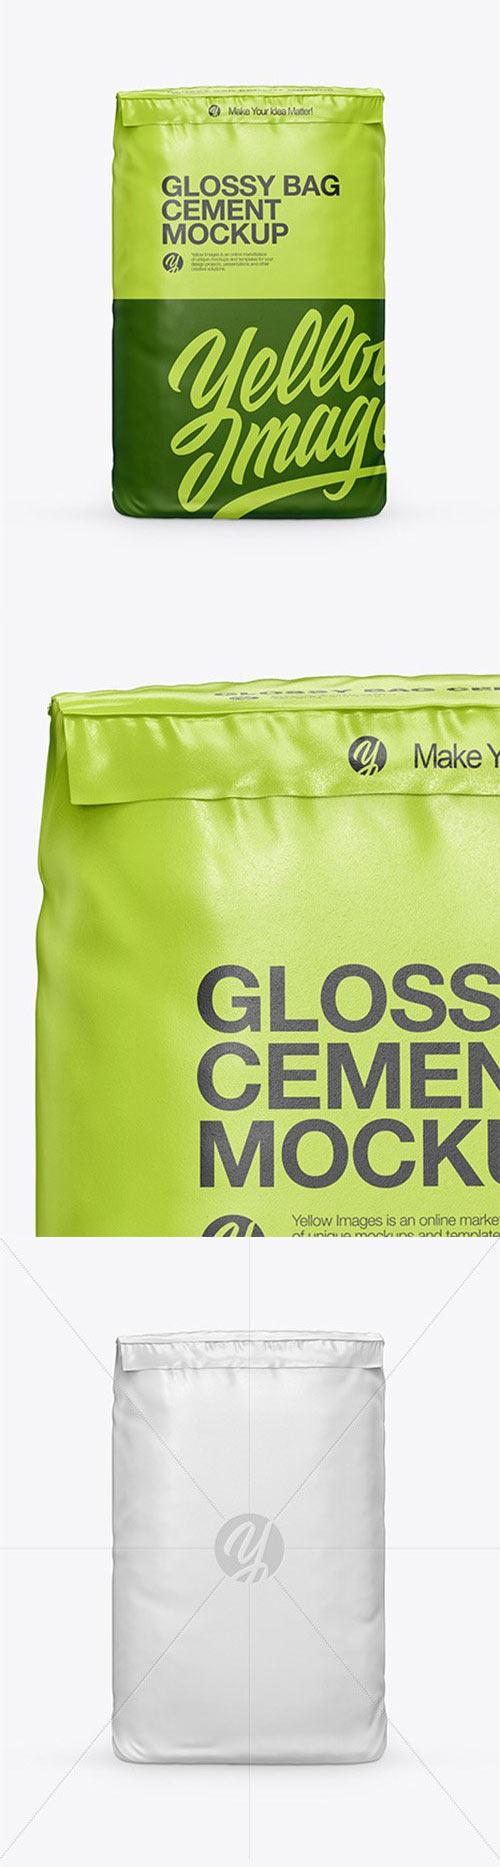 Download Glossy Cement Bag Mockup Mockups Free Psd Templates Bag Mockup Psd Template Free Glossier Bag